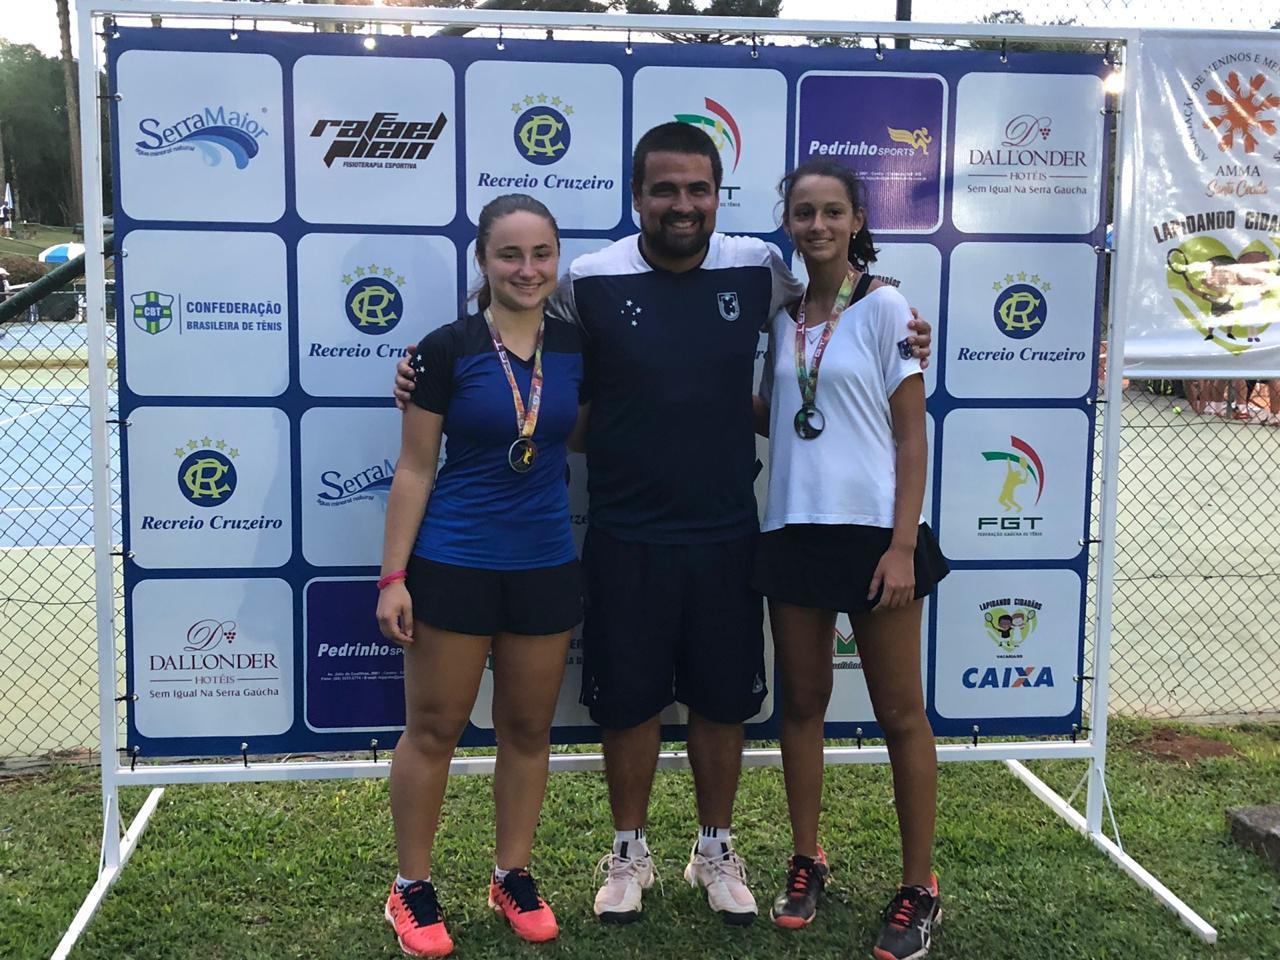 Da esquerda para direita: Juliana Kulczynski / Leonardo Santos Sperry (Dado) / Elisa Dornelles